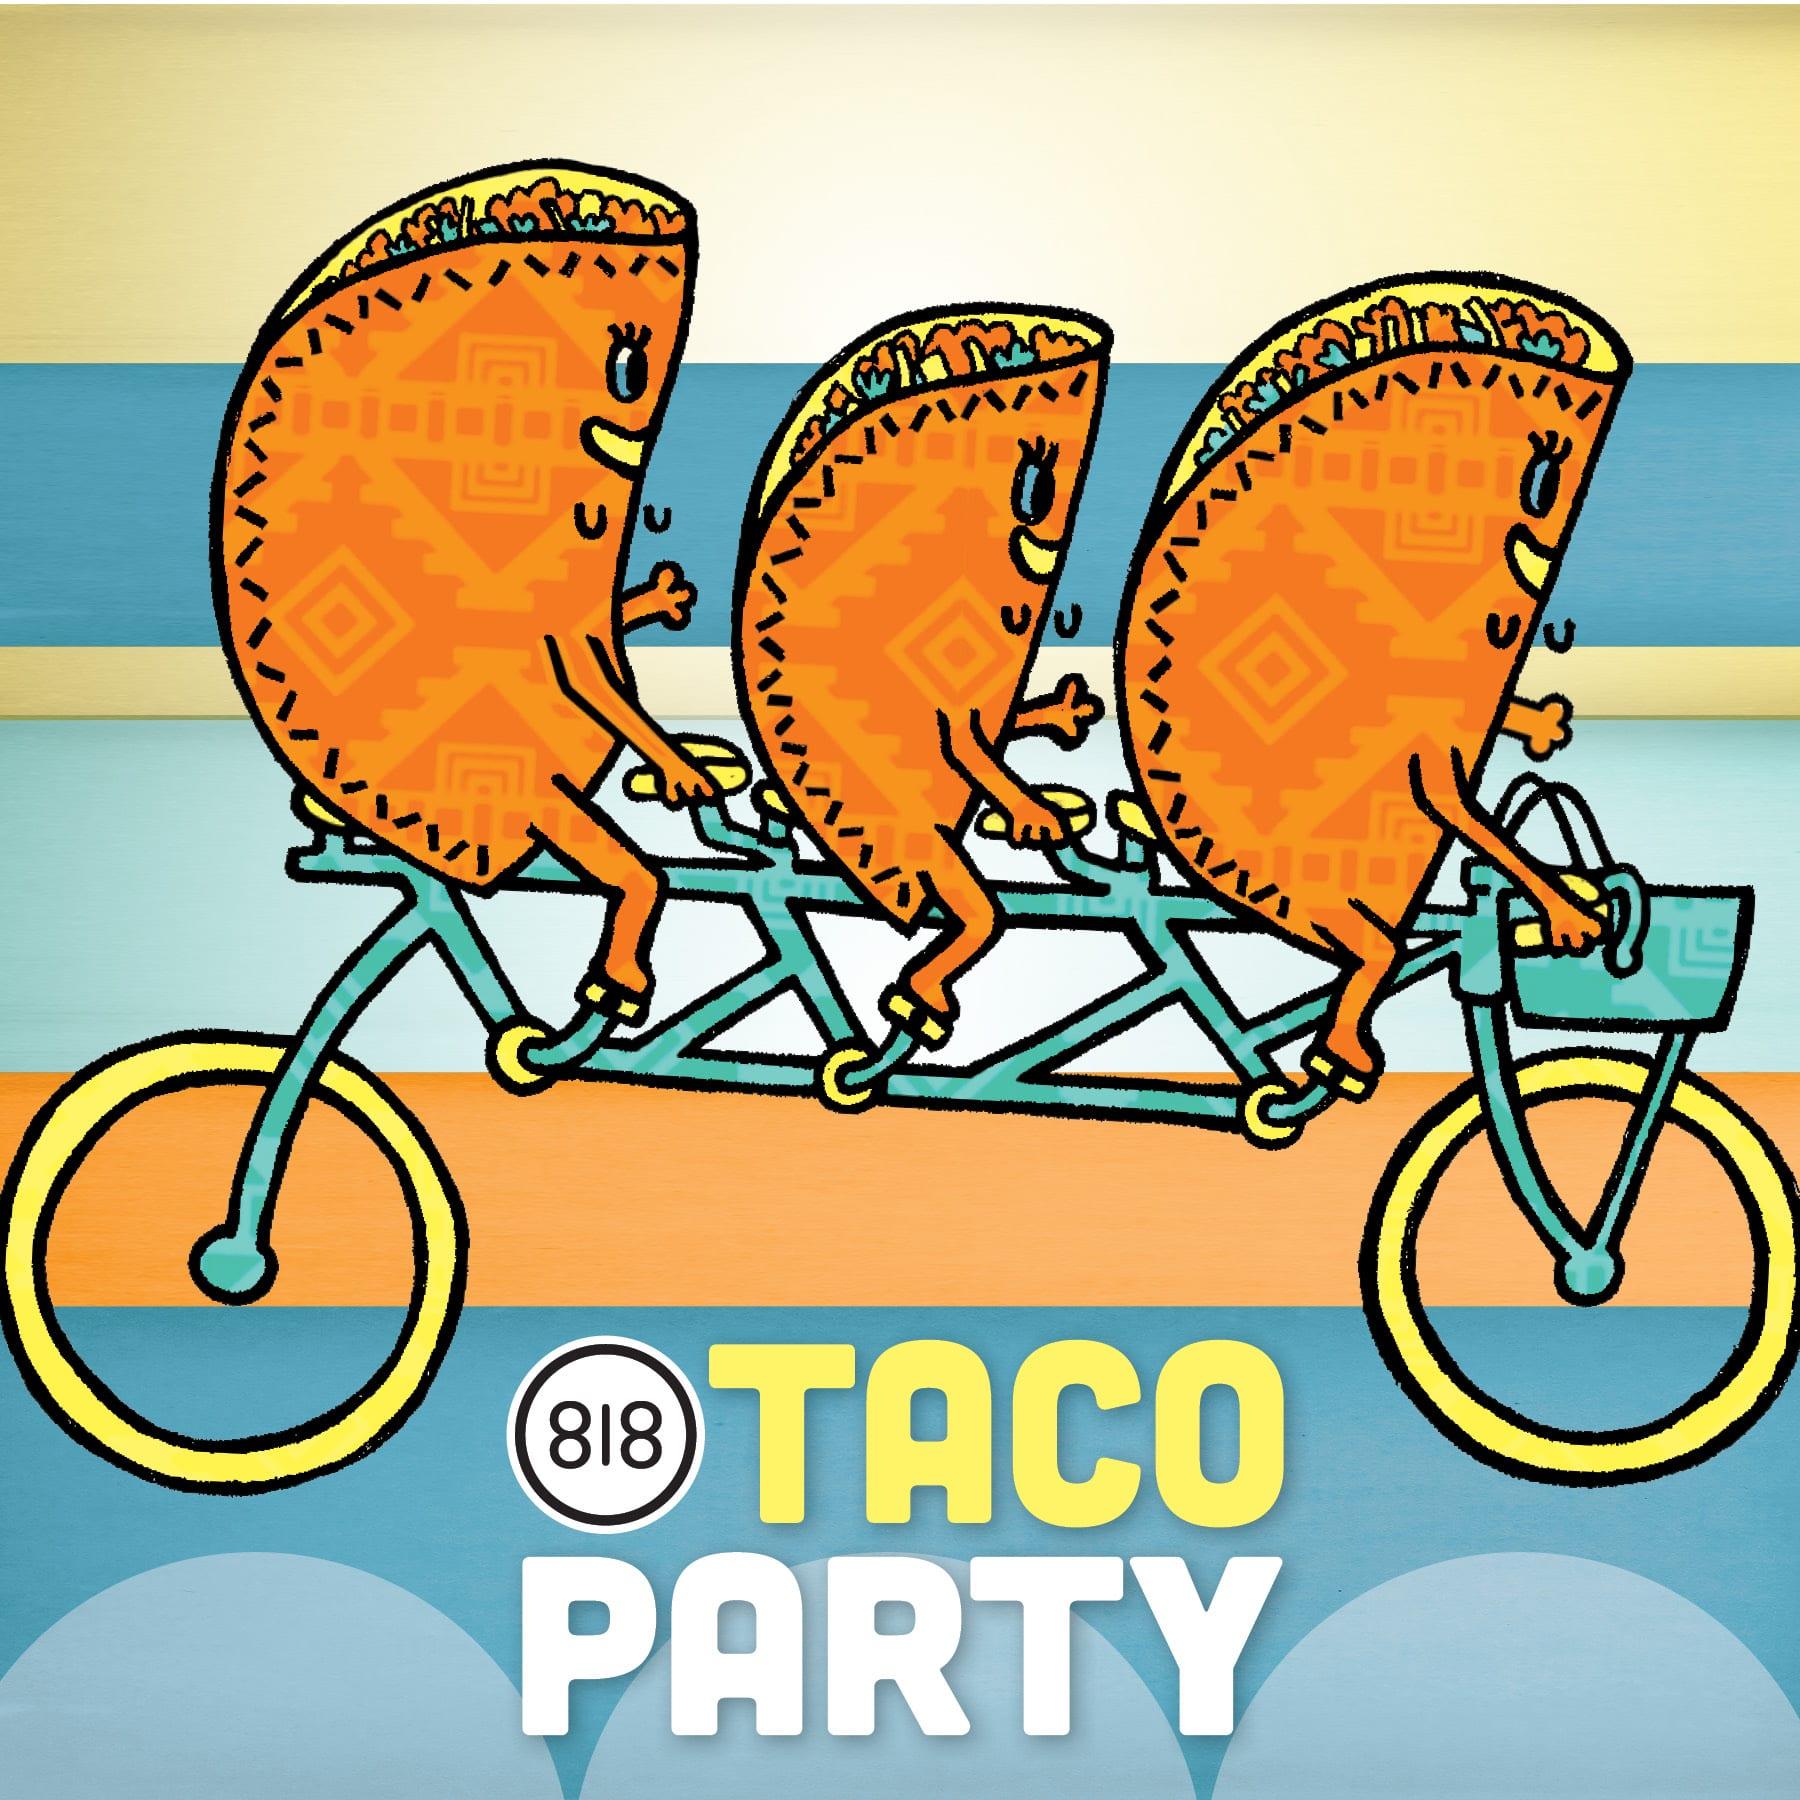 818 Taco Party!